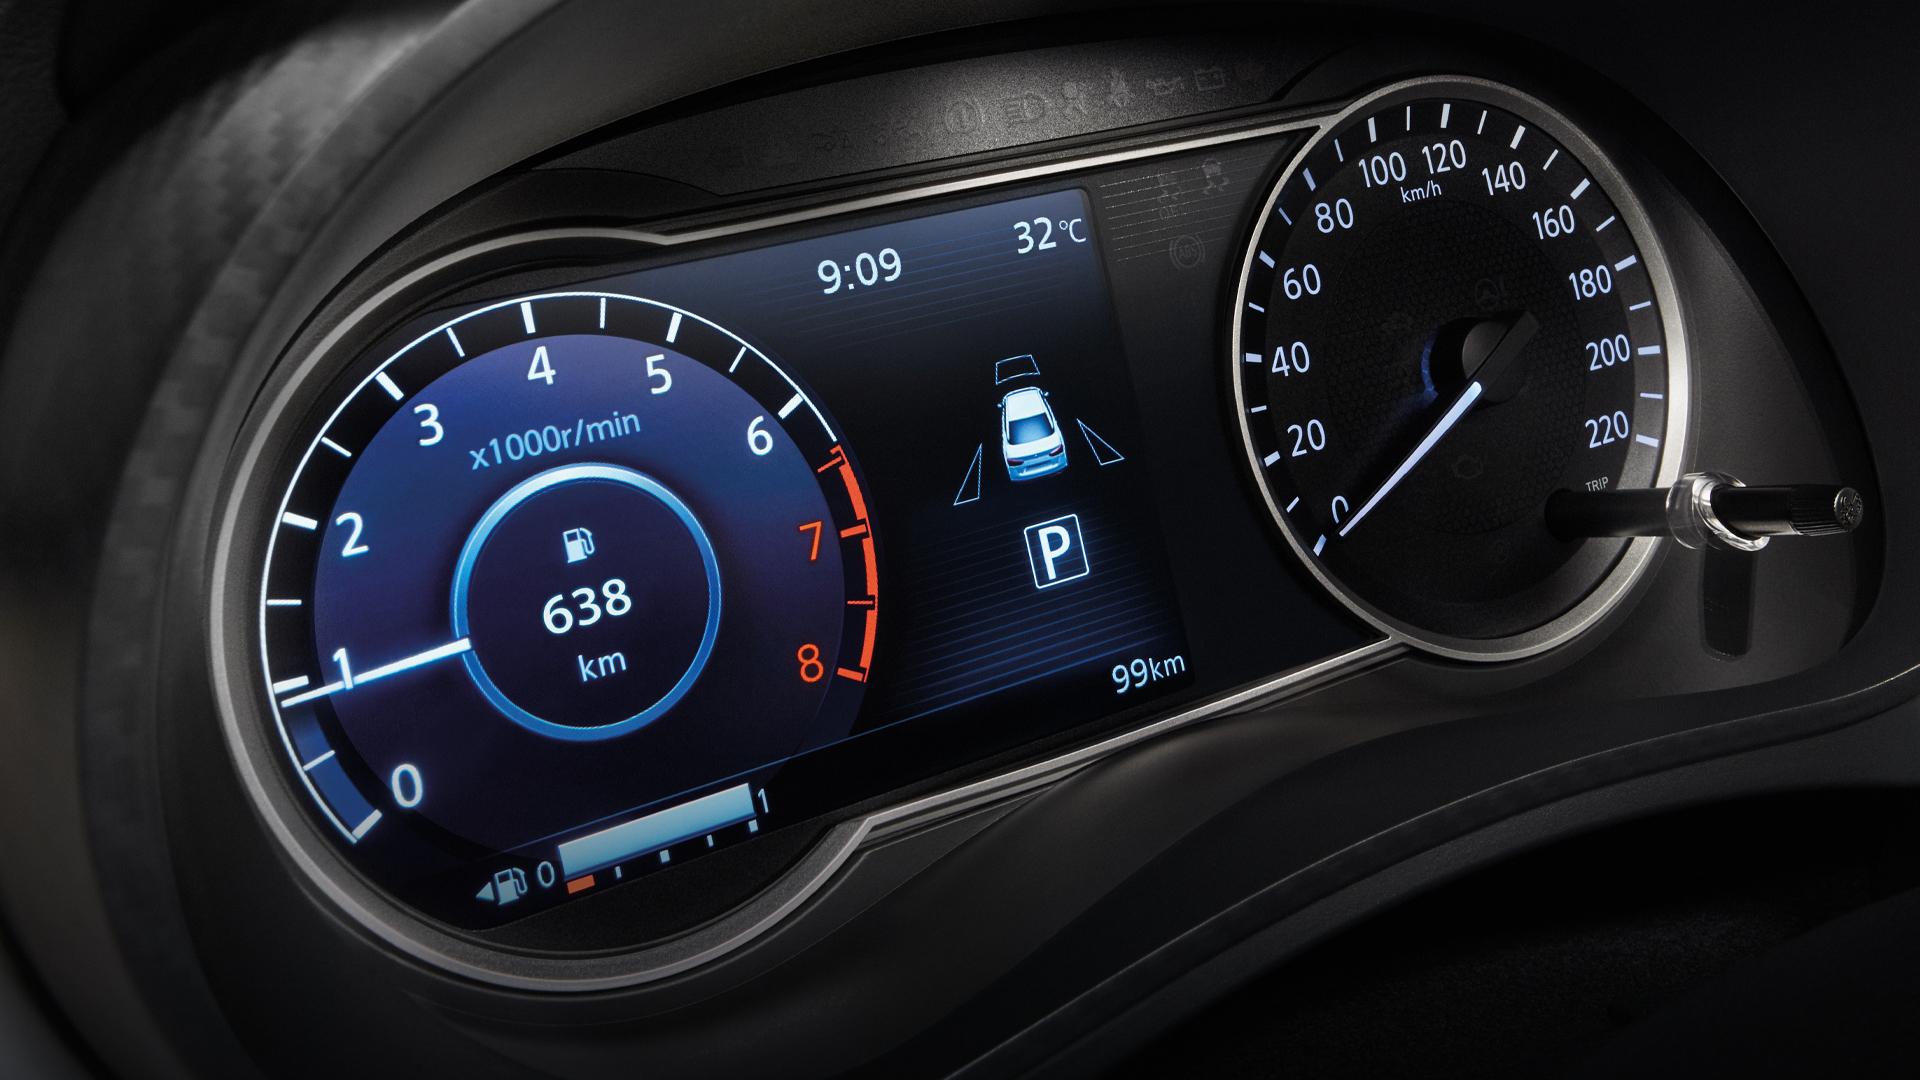 "Full colour 7"" semi digital display provides brilliant customizable drive Information"